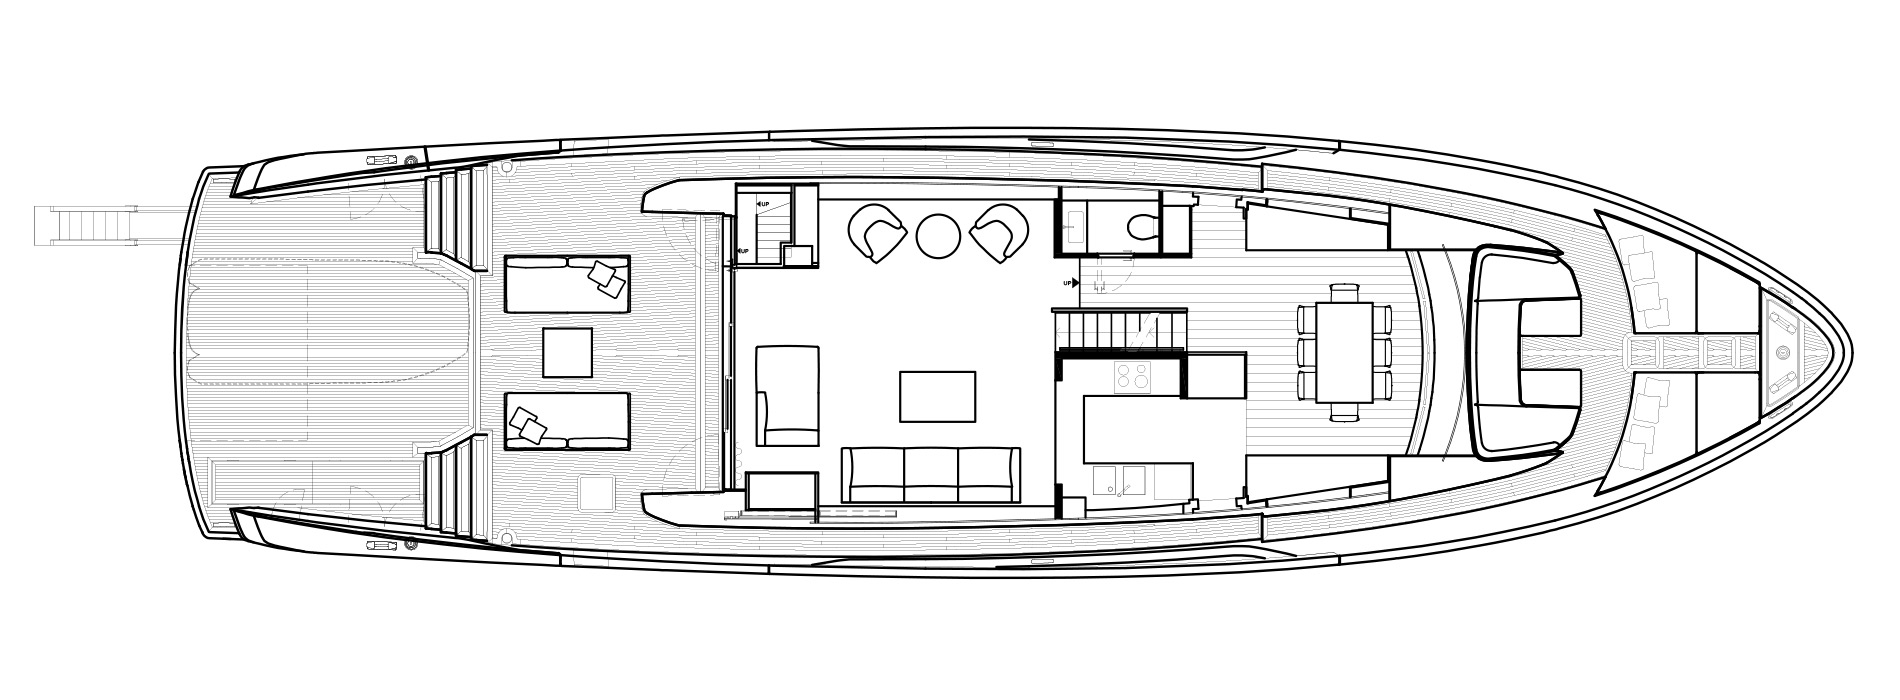 Sanlorenzo Yachts SX88 Главная палуба версия A Open Galley